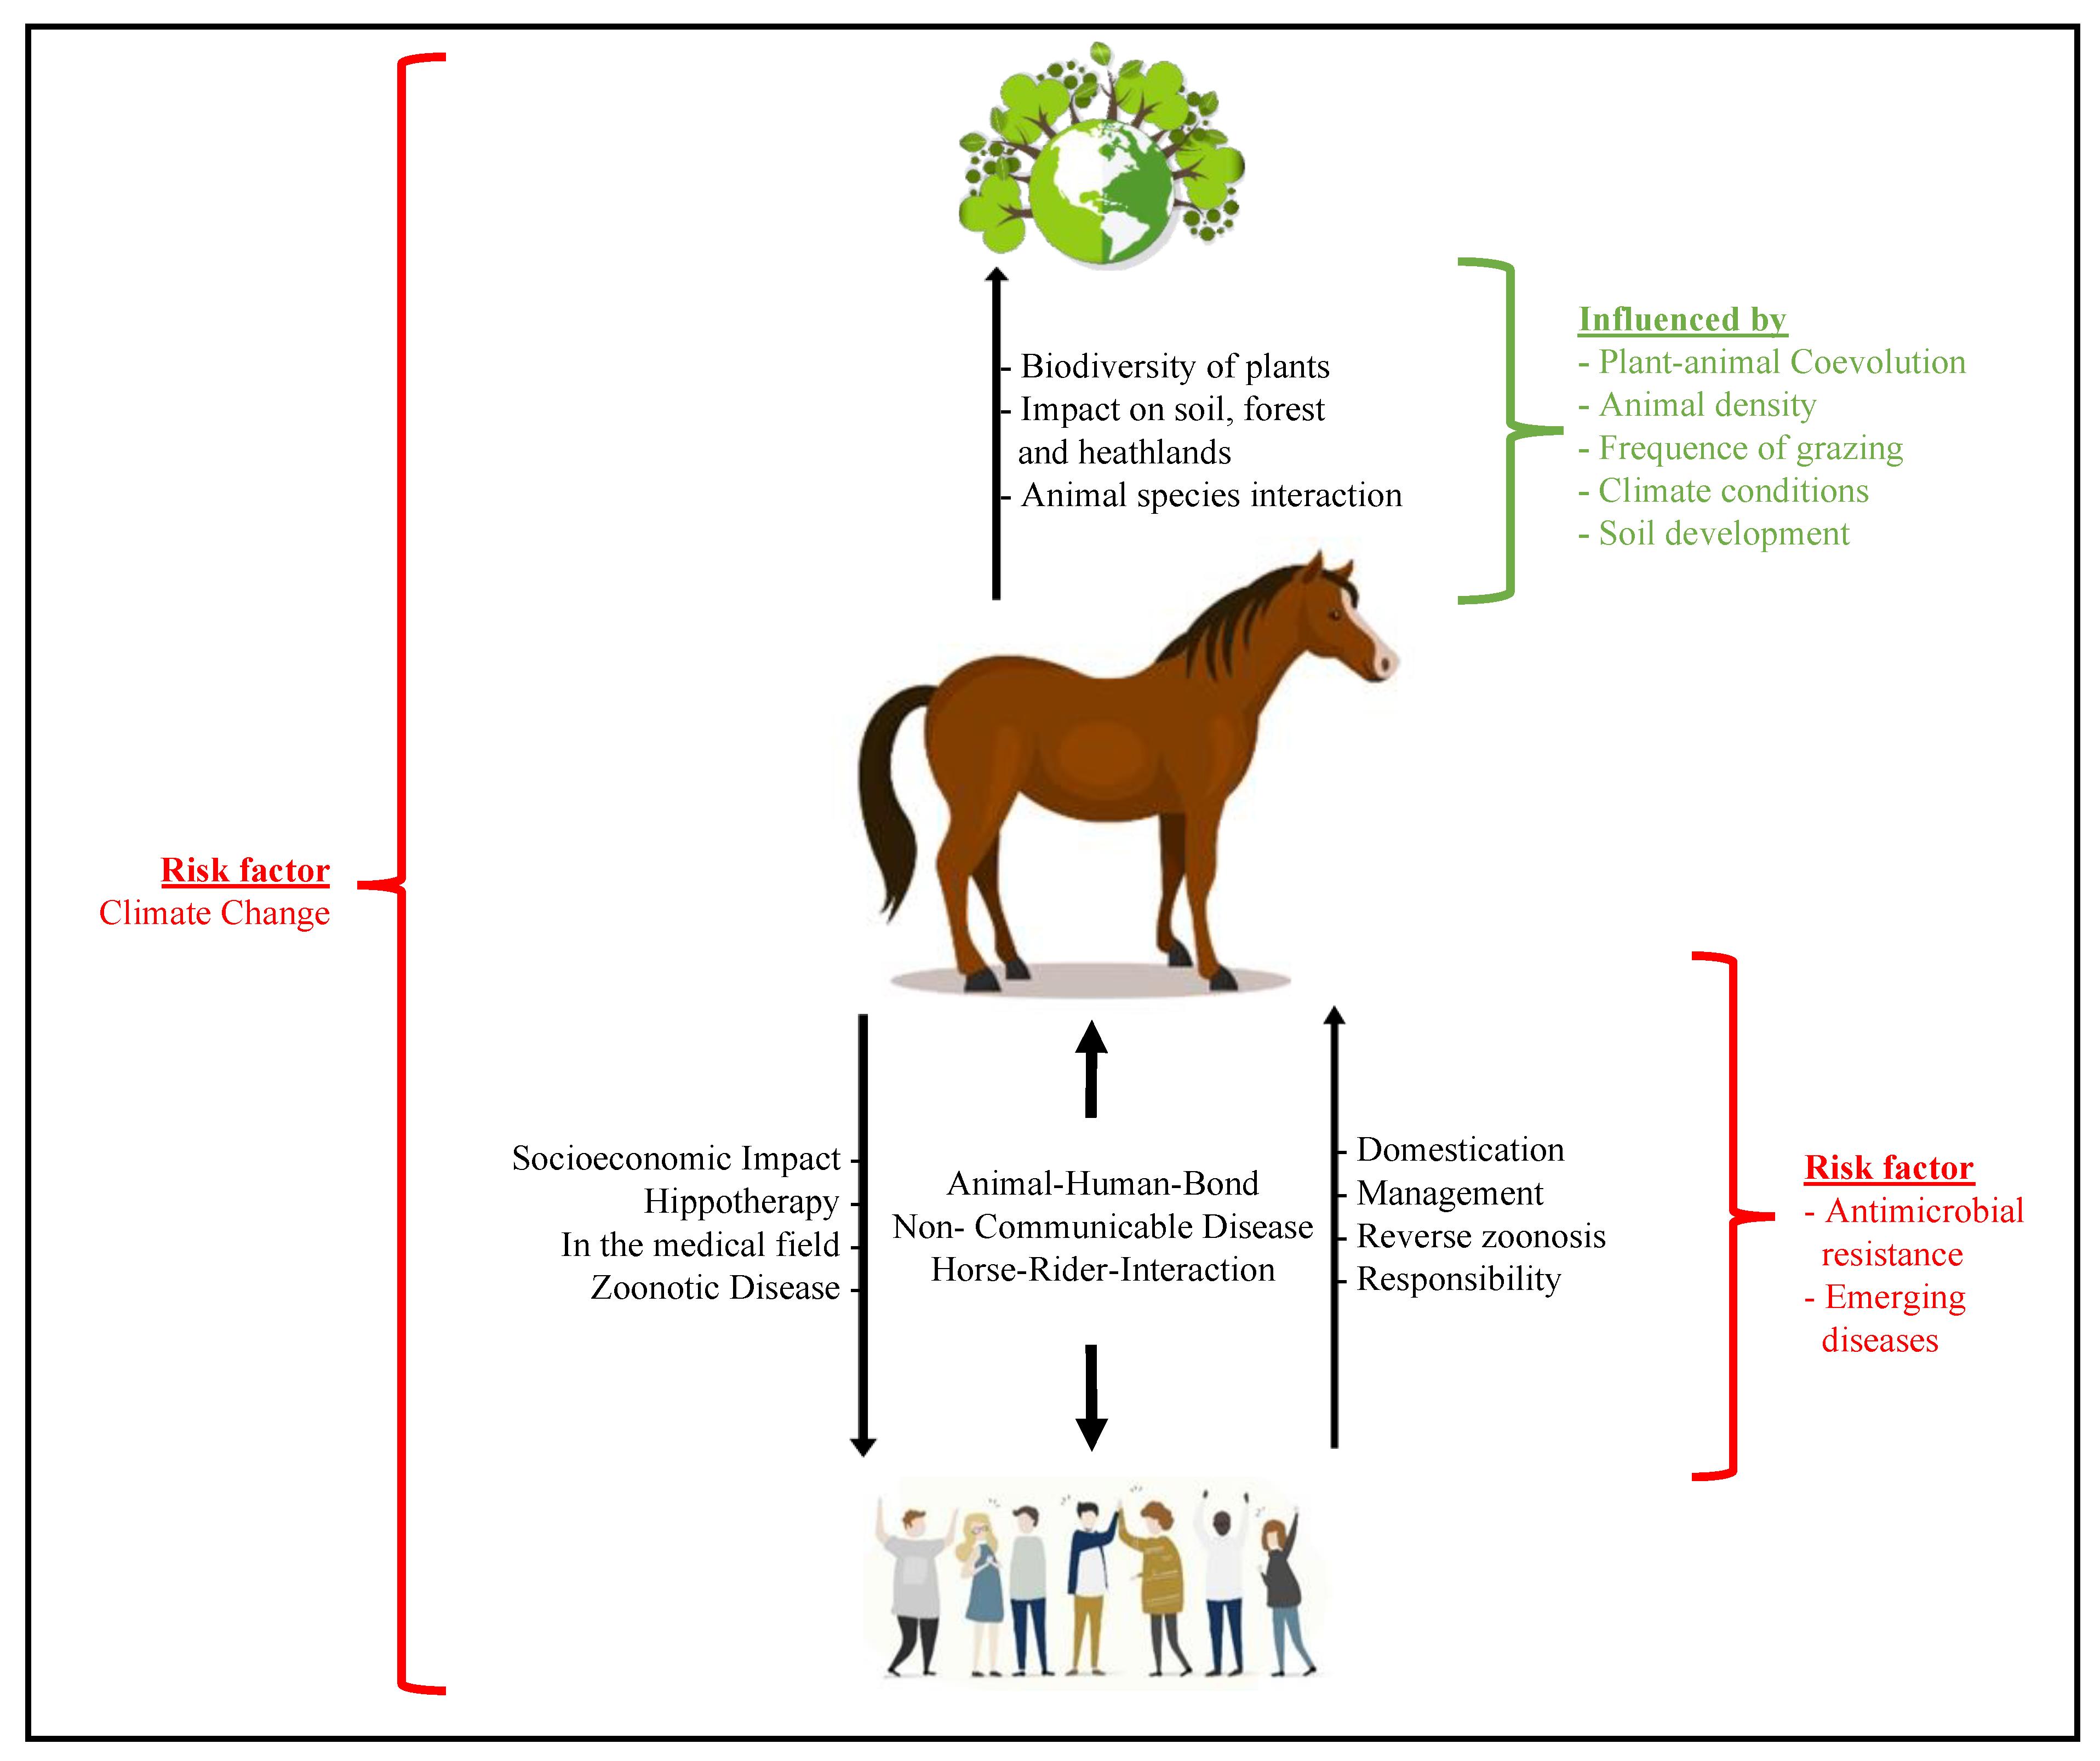 Ferdocat belsőleges gél A.U.V. Giardia in horses